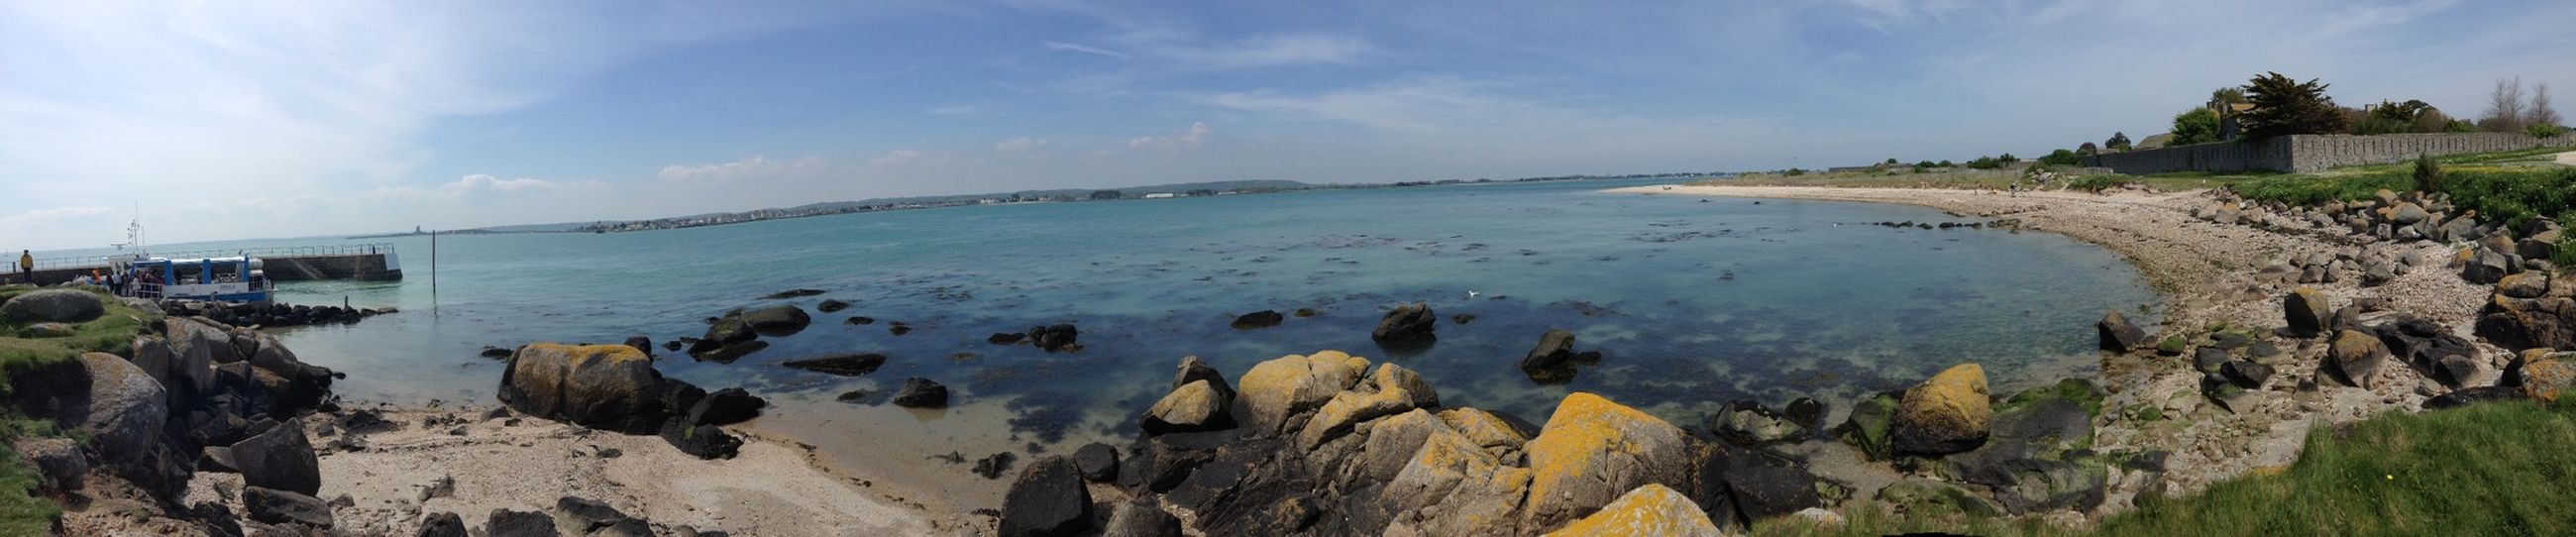 Vacance Famille Soleil☀️ Amis  île Mer